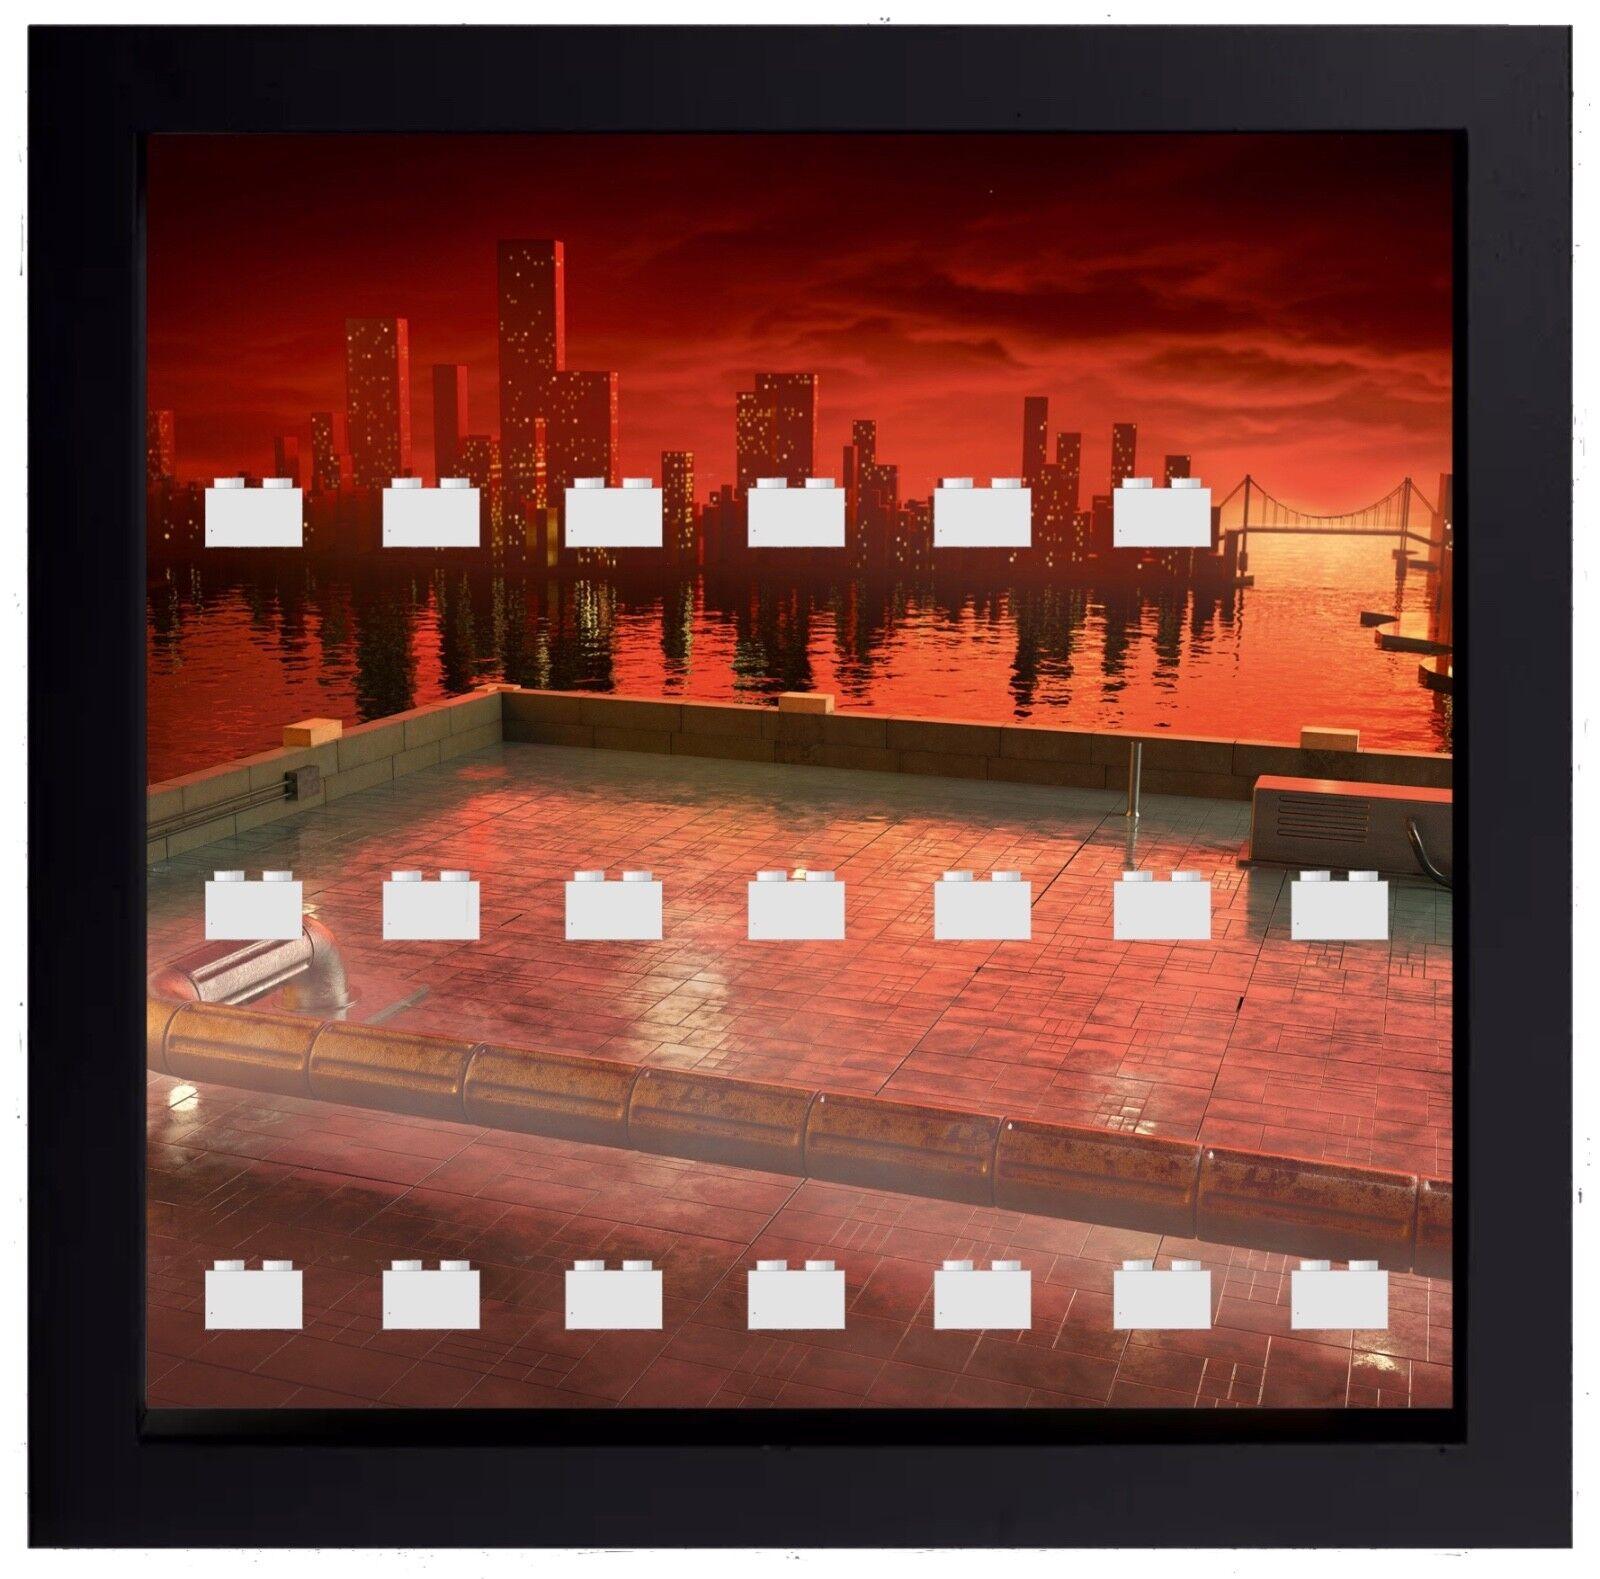 Display Case Frame for Lego Batman Movie Series 1 or 2 minifigures figures 25cm